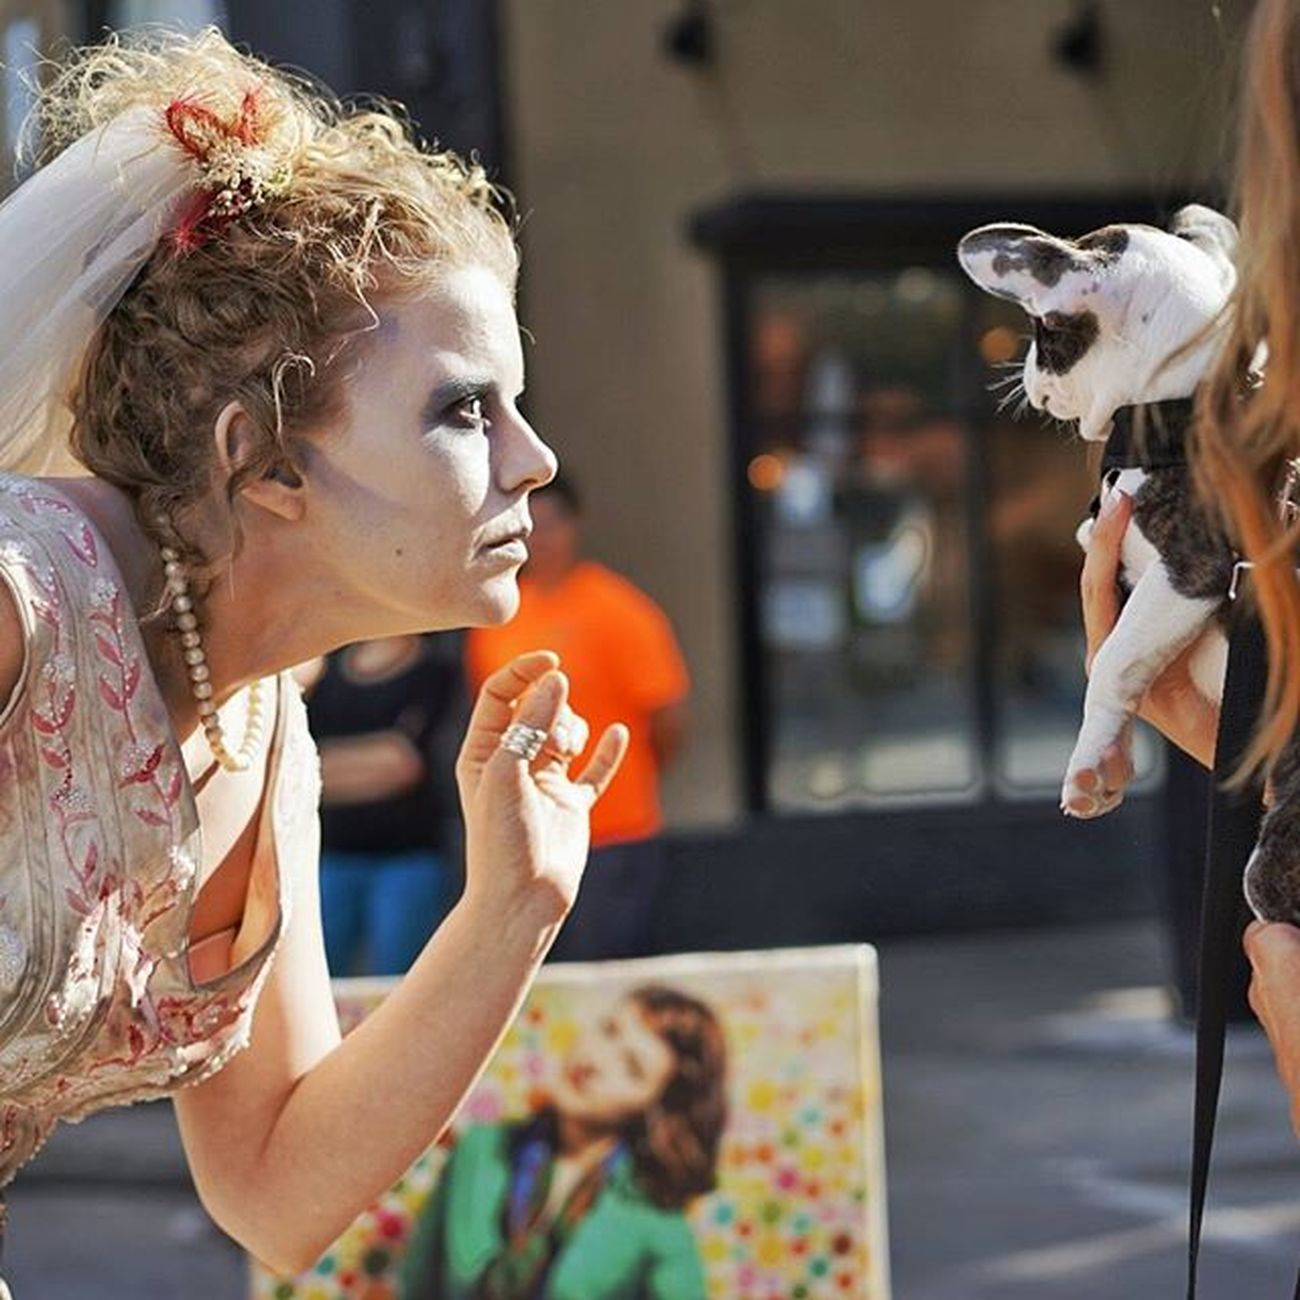 Zombie bride meets a little doggy @ Yxefringe